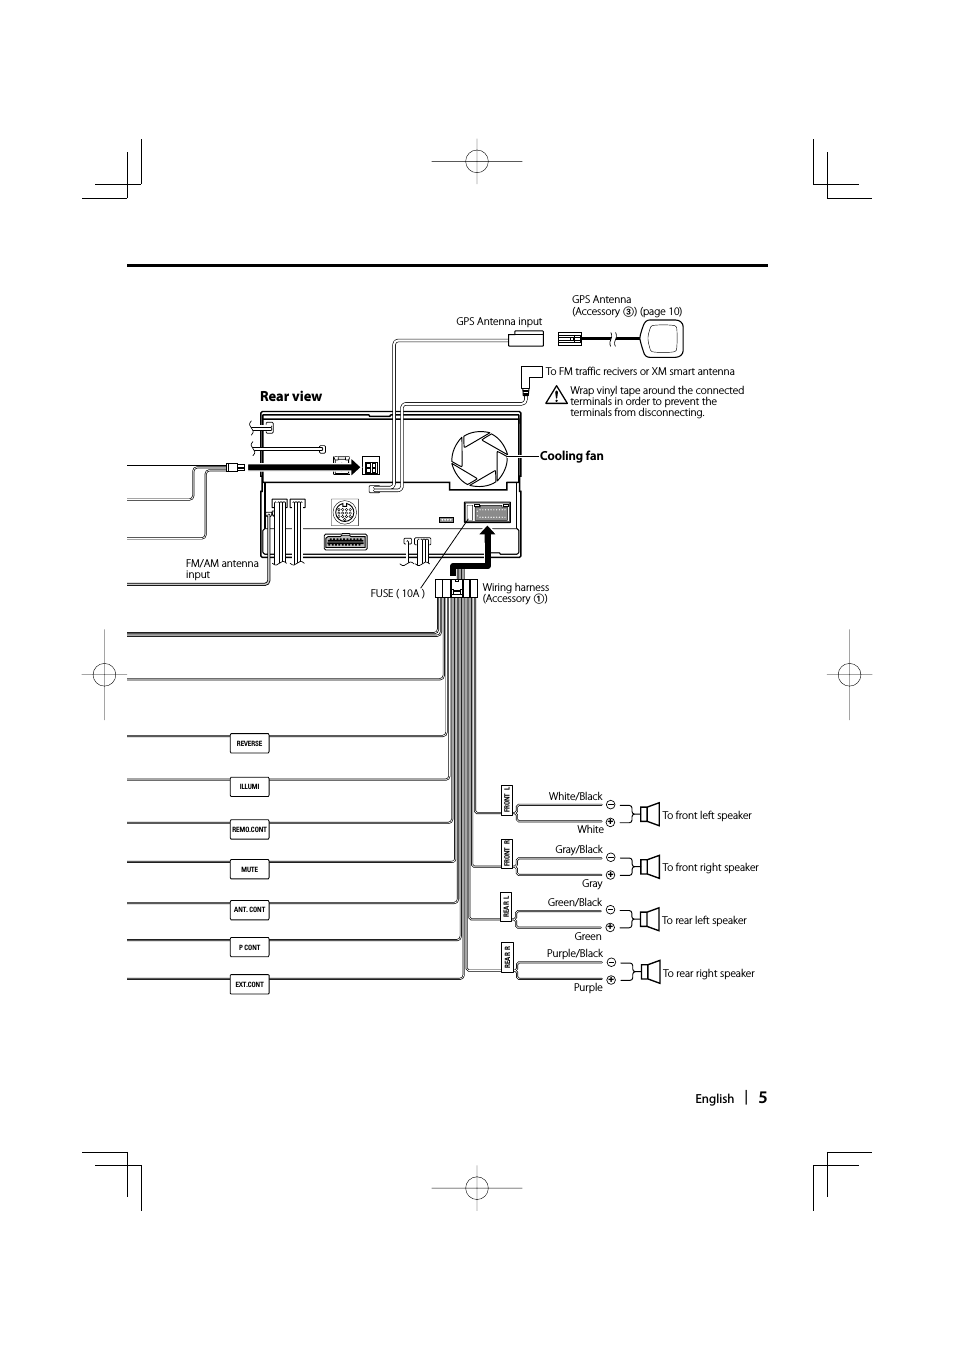 Diagram Car Audio Wiring Diagram For Kenwood Kdc 348u Full Version Hd Quality Kdc 348u Dailyebookstore Physalisweddings Fr